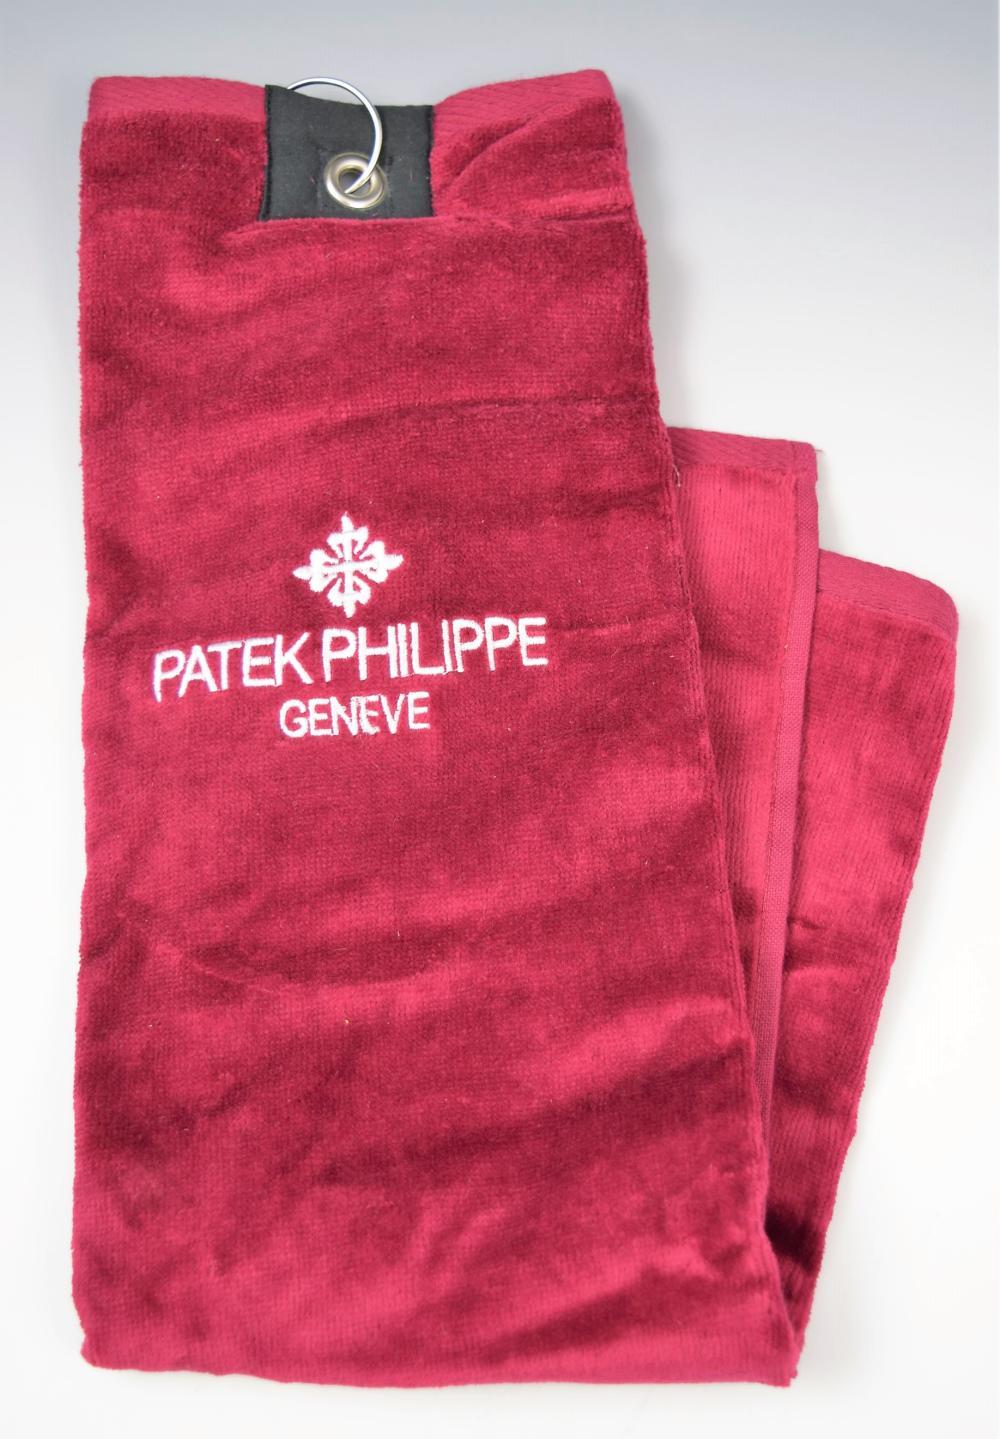 Patek Philippe Golf Towel